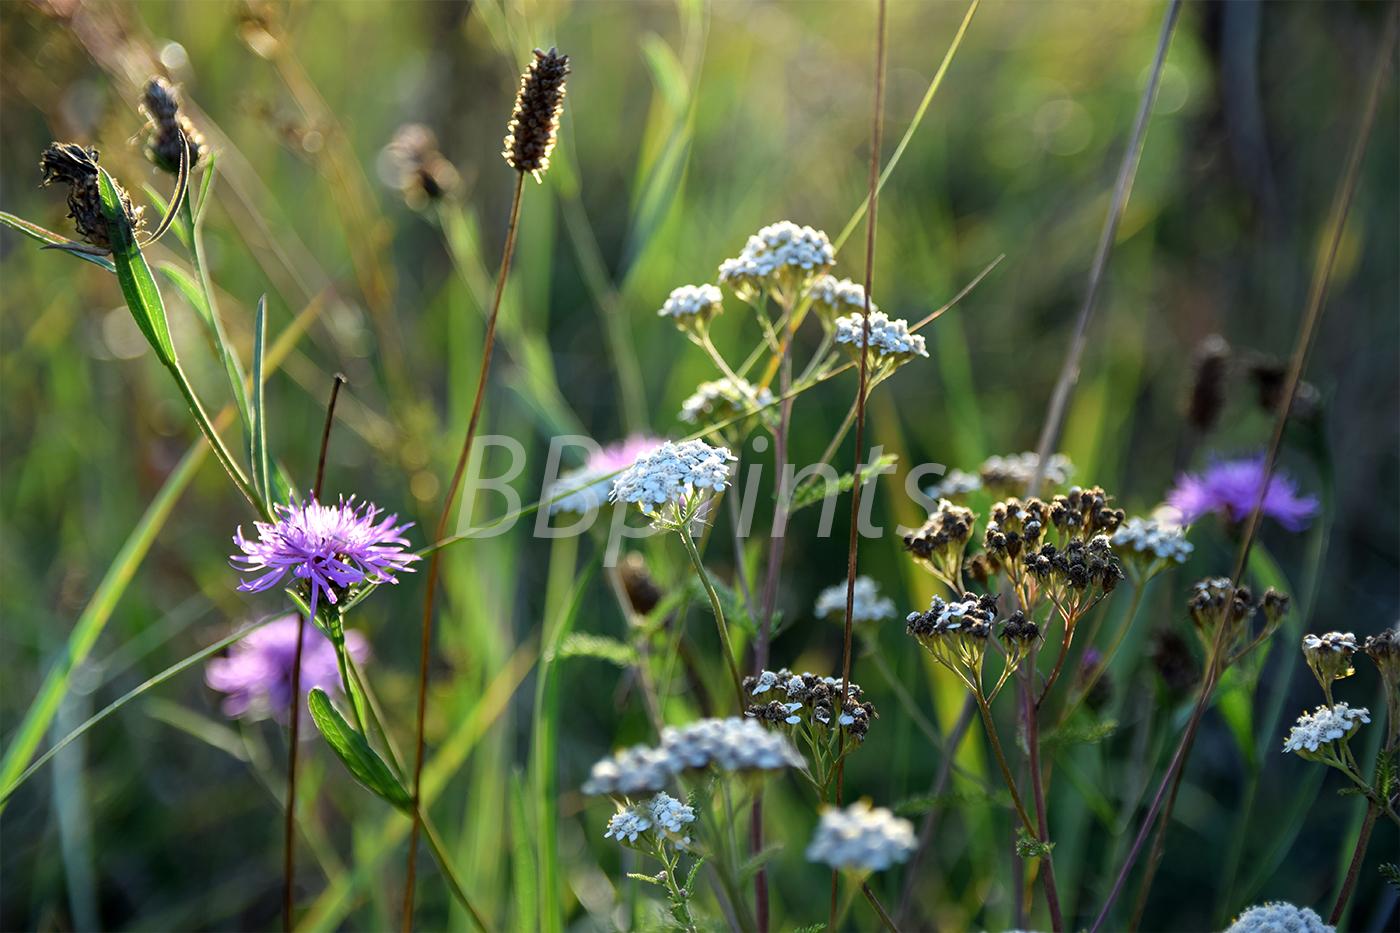 Nature photo, landscape photo, floral photo, summer photo, example image 1